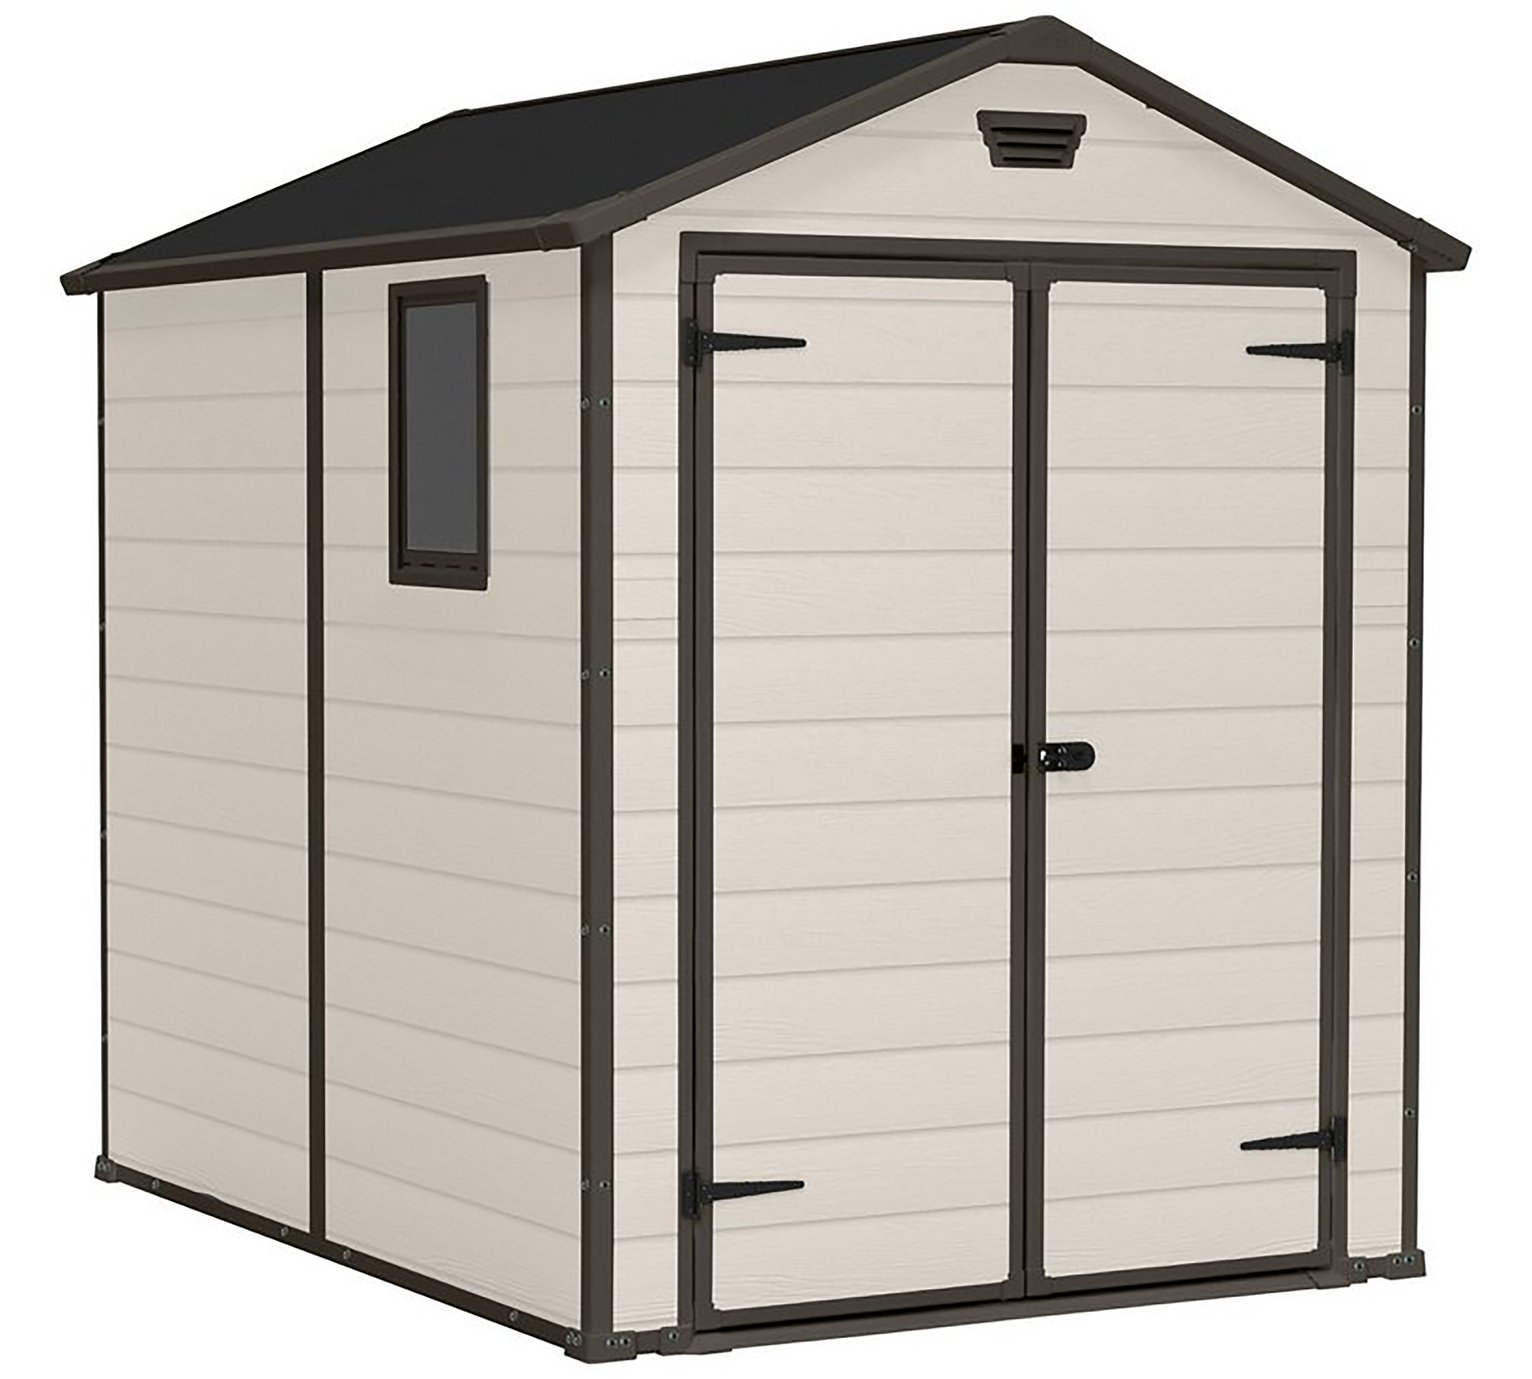 Garden Sheds Argos buy keter manor plastic beige & brown garden shed - 6 x 8ft at